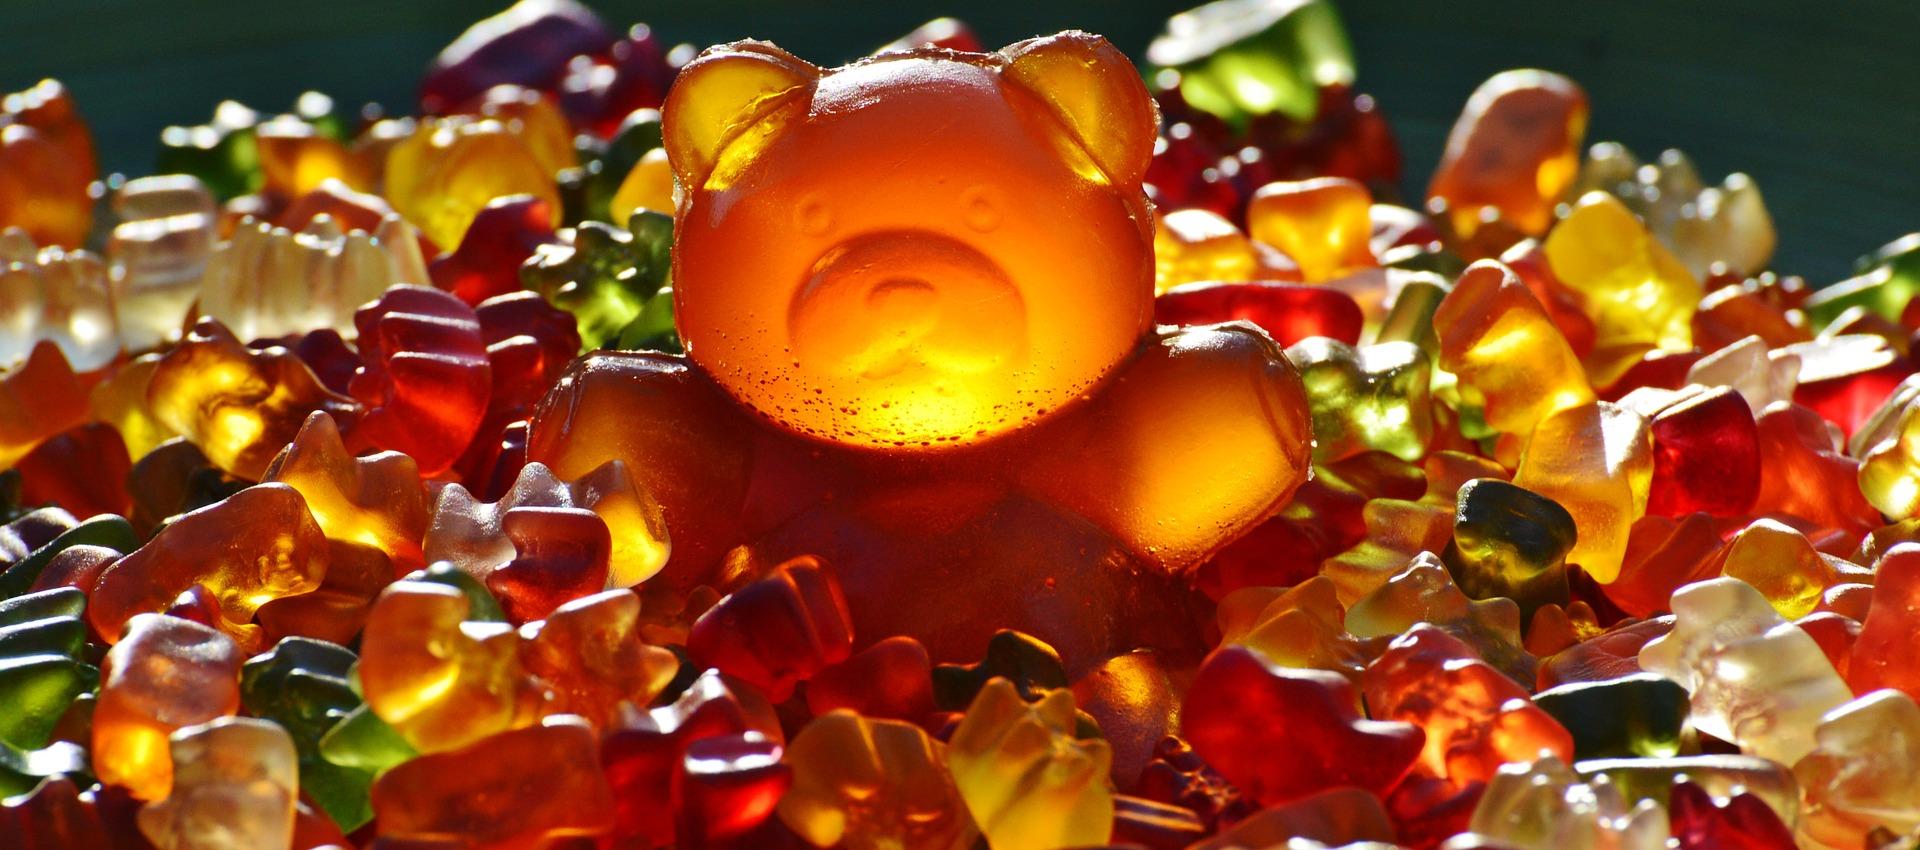 An enormous gummy bear surrounded by tiny gummy bears.